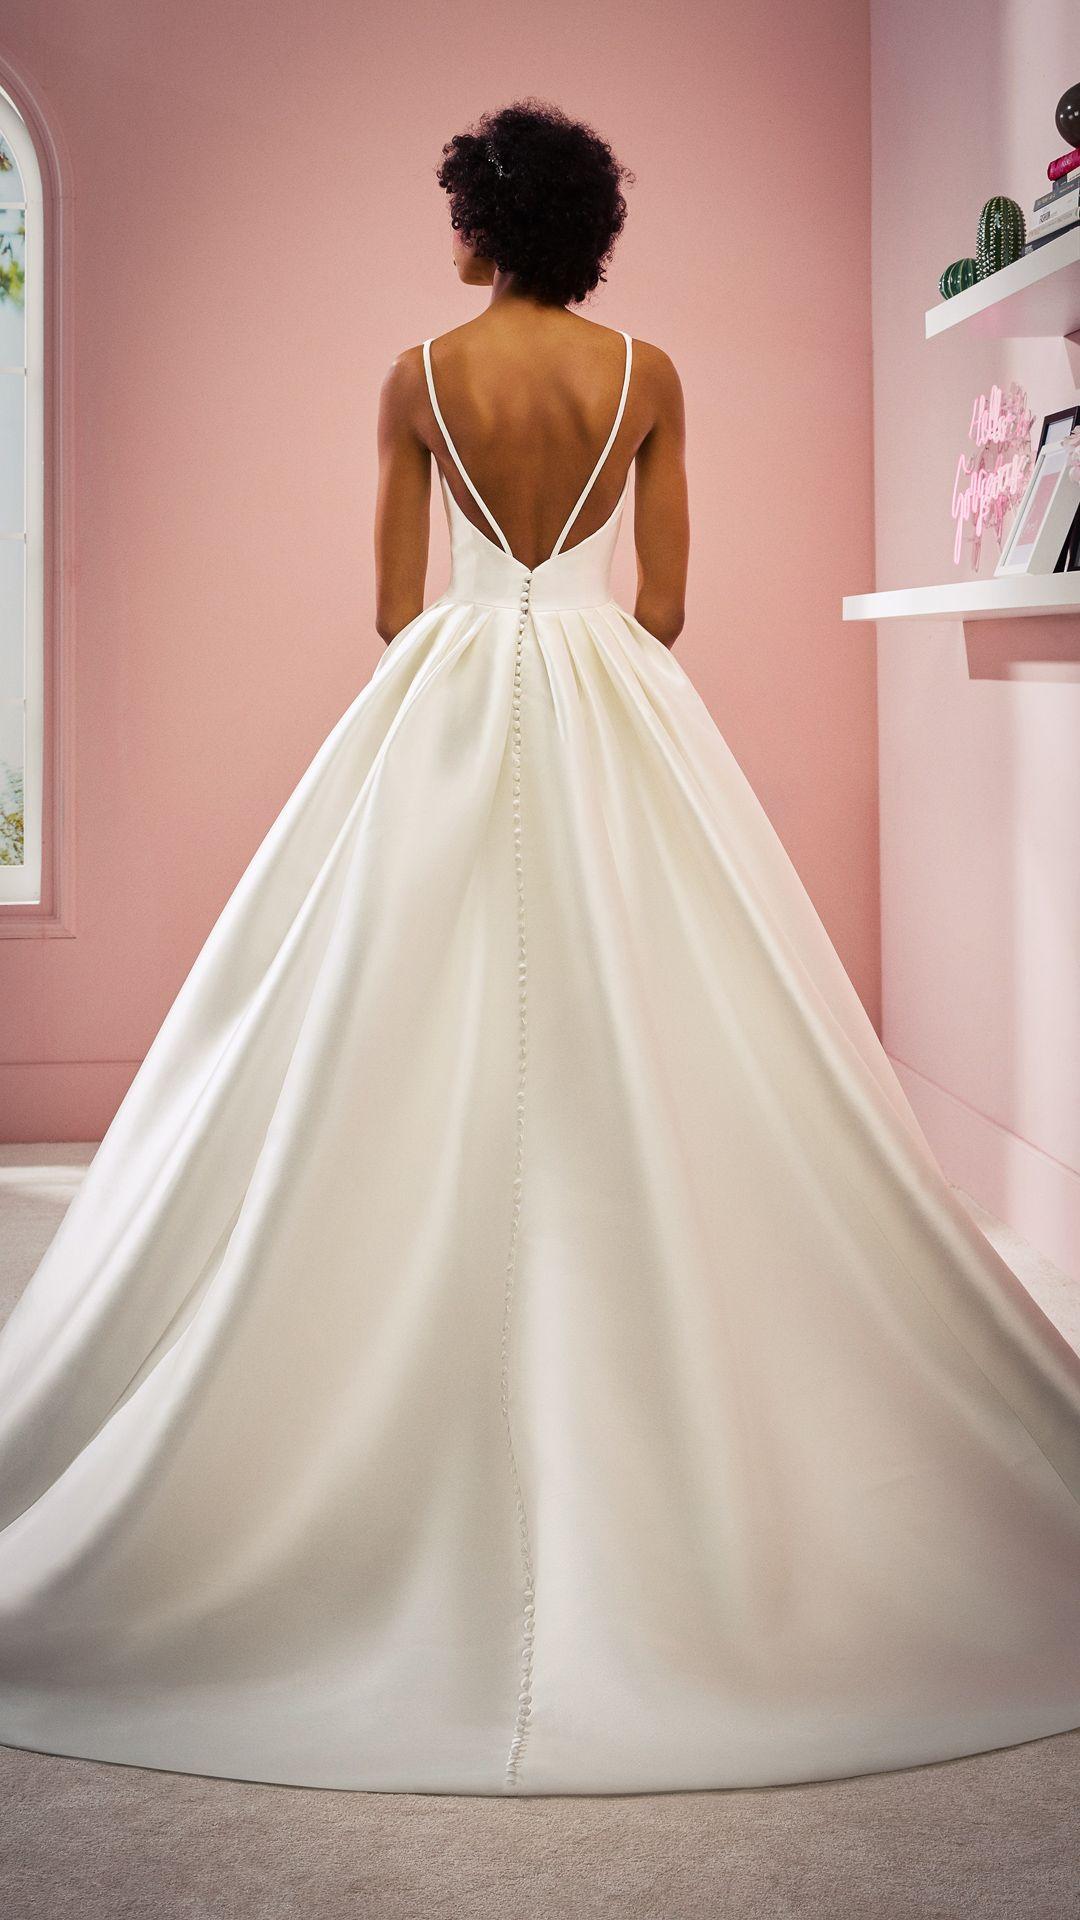 Hochzeitskleider 20 White One Kollektion Modell: VANESSA-C